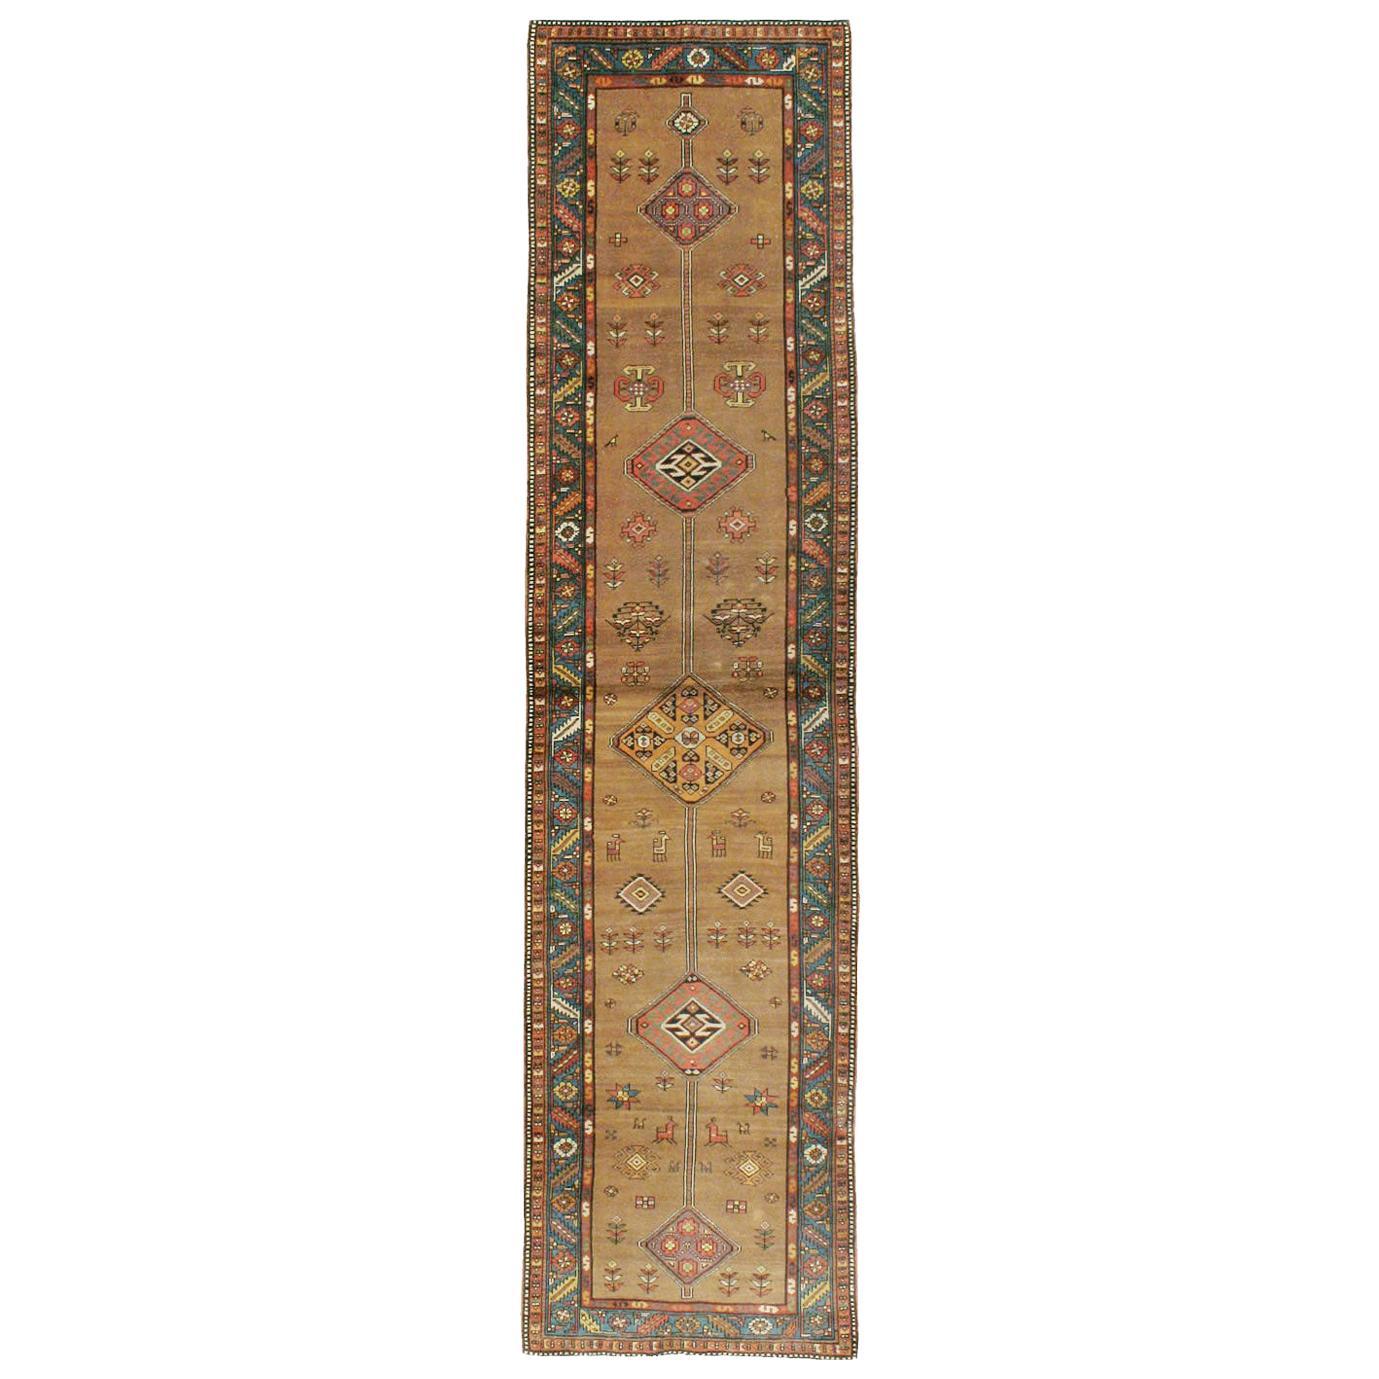 Handmade Persian Serab Folk Runner in Brown and Blue-Green